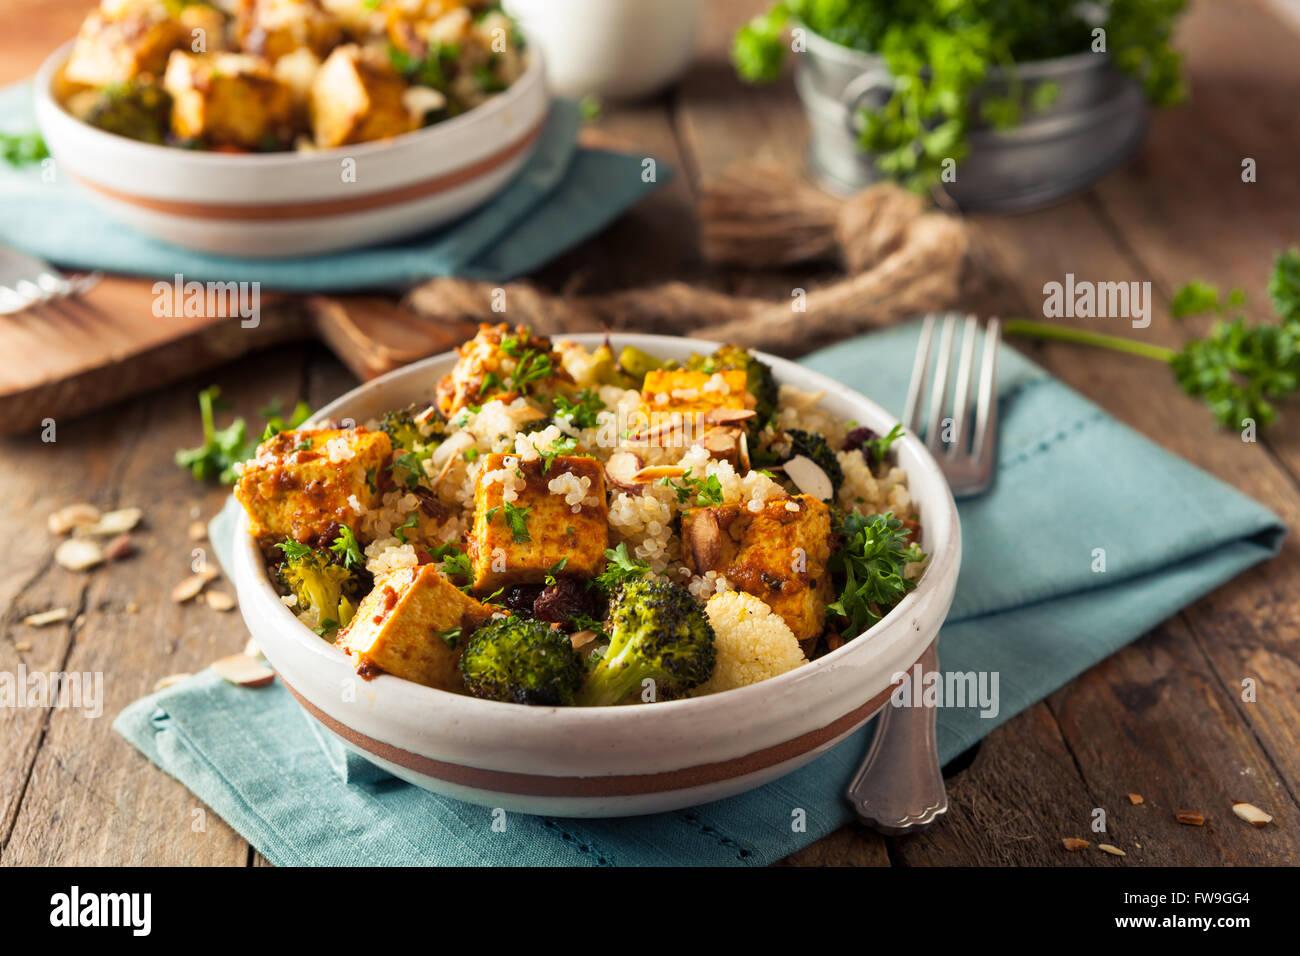 Homemade Quinoa Tofu Bowl with Roasted Veggies and Herbs - Stock Image